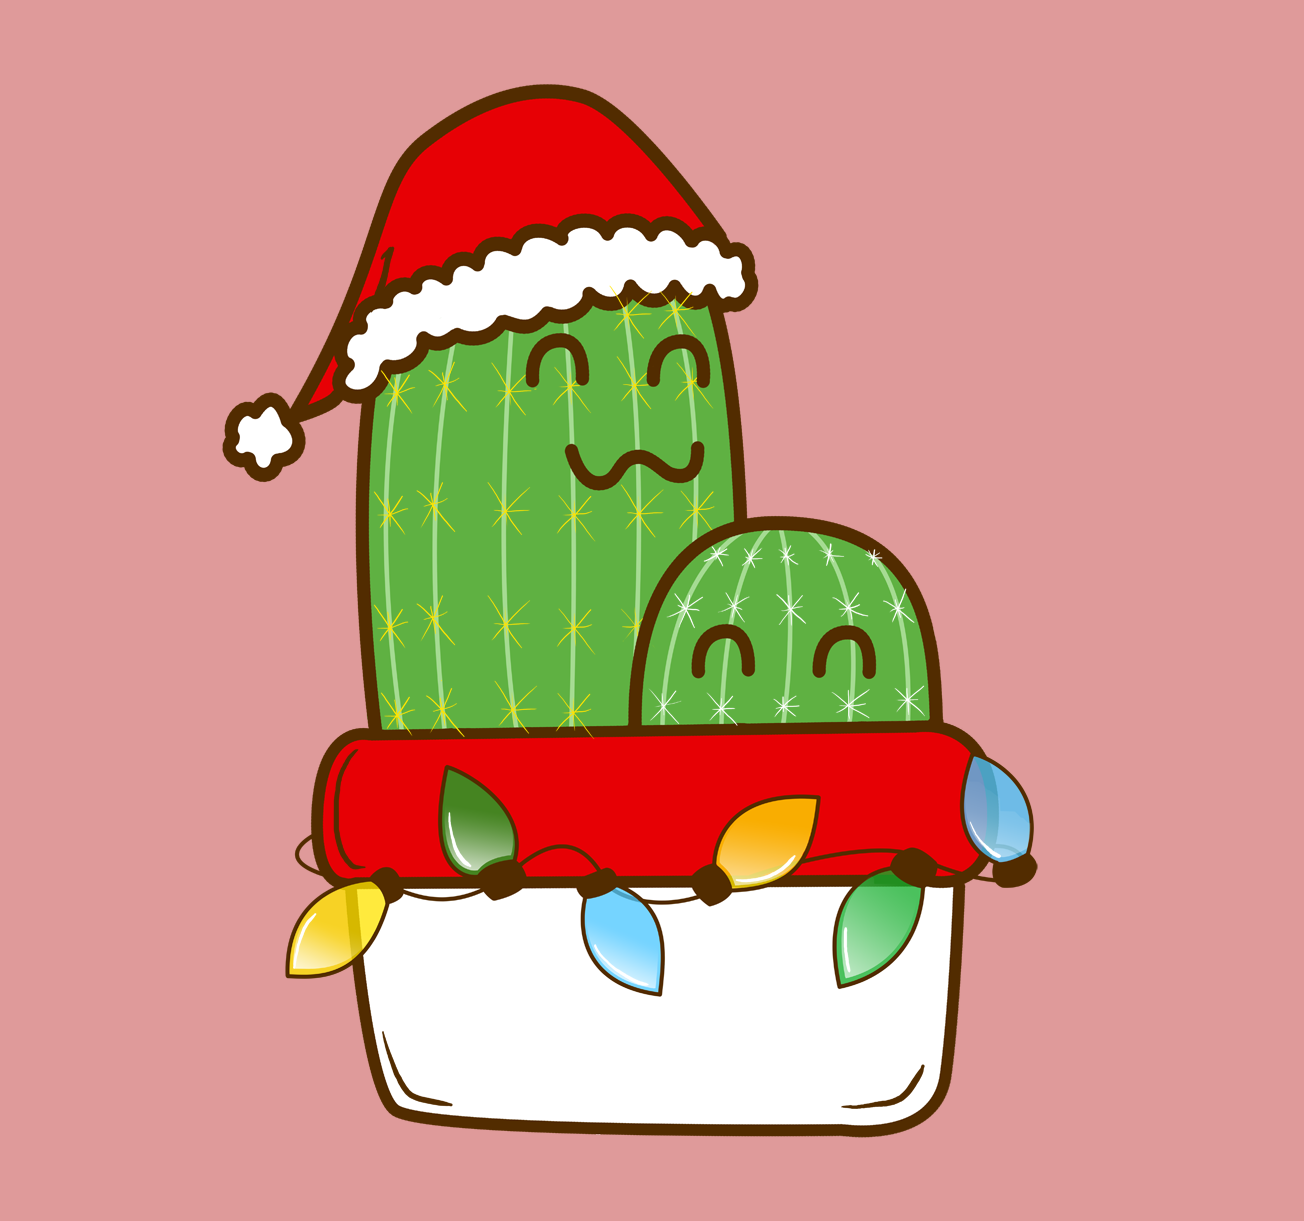 Cute Holiday Christmas Cactus Sleeveless Top By Artrus Christmas Tree Wallpaper Christmas Cactus Homemade Christmas Crafts